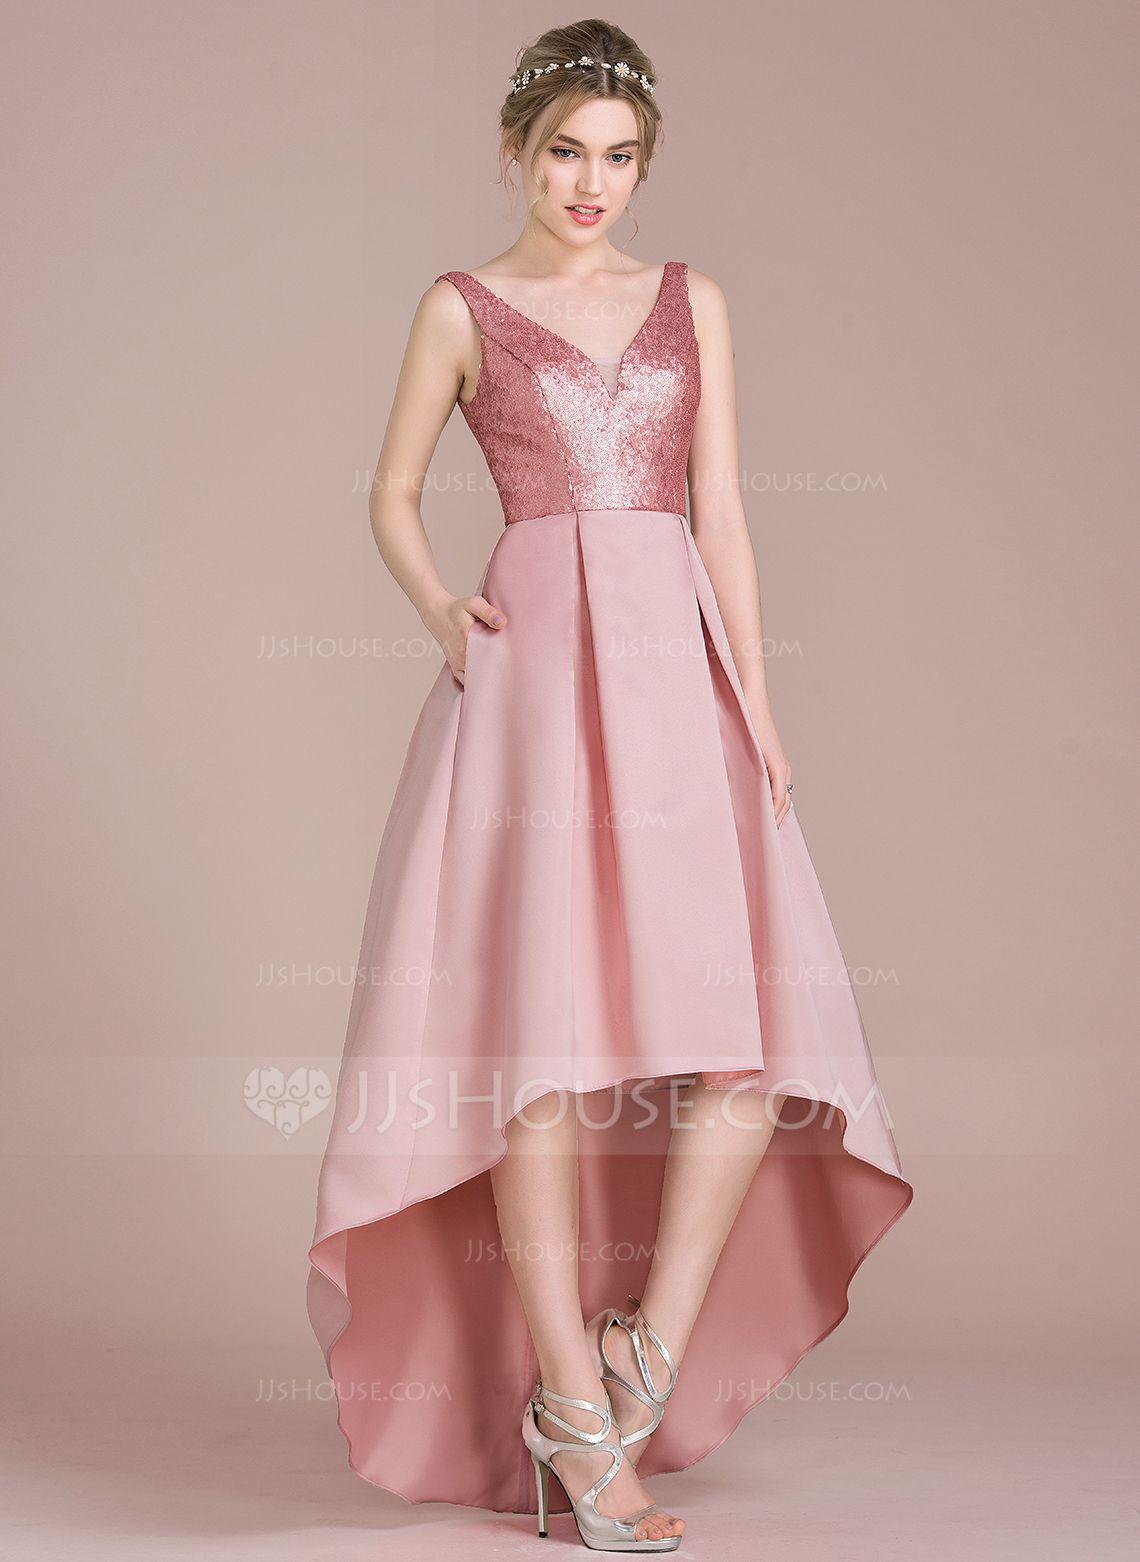 Dress for wedding party female  ALinePrincess Vneck Asymmetrical Satin Sequined Bridesmaid Dress